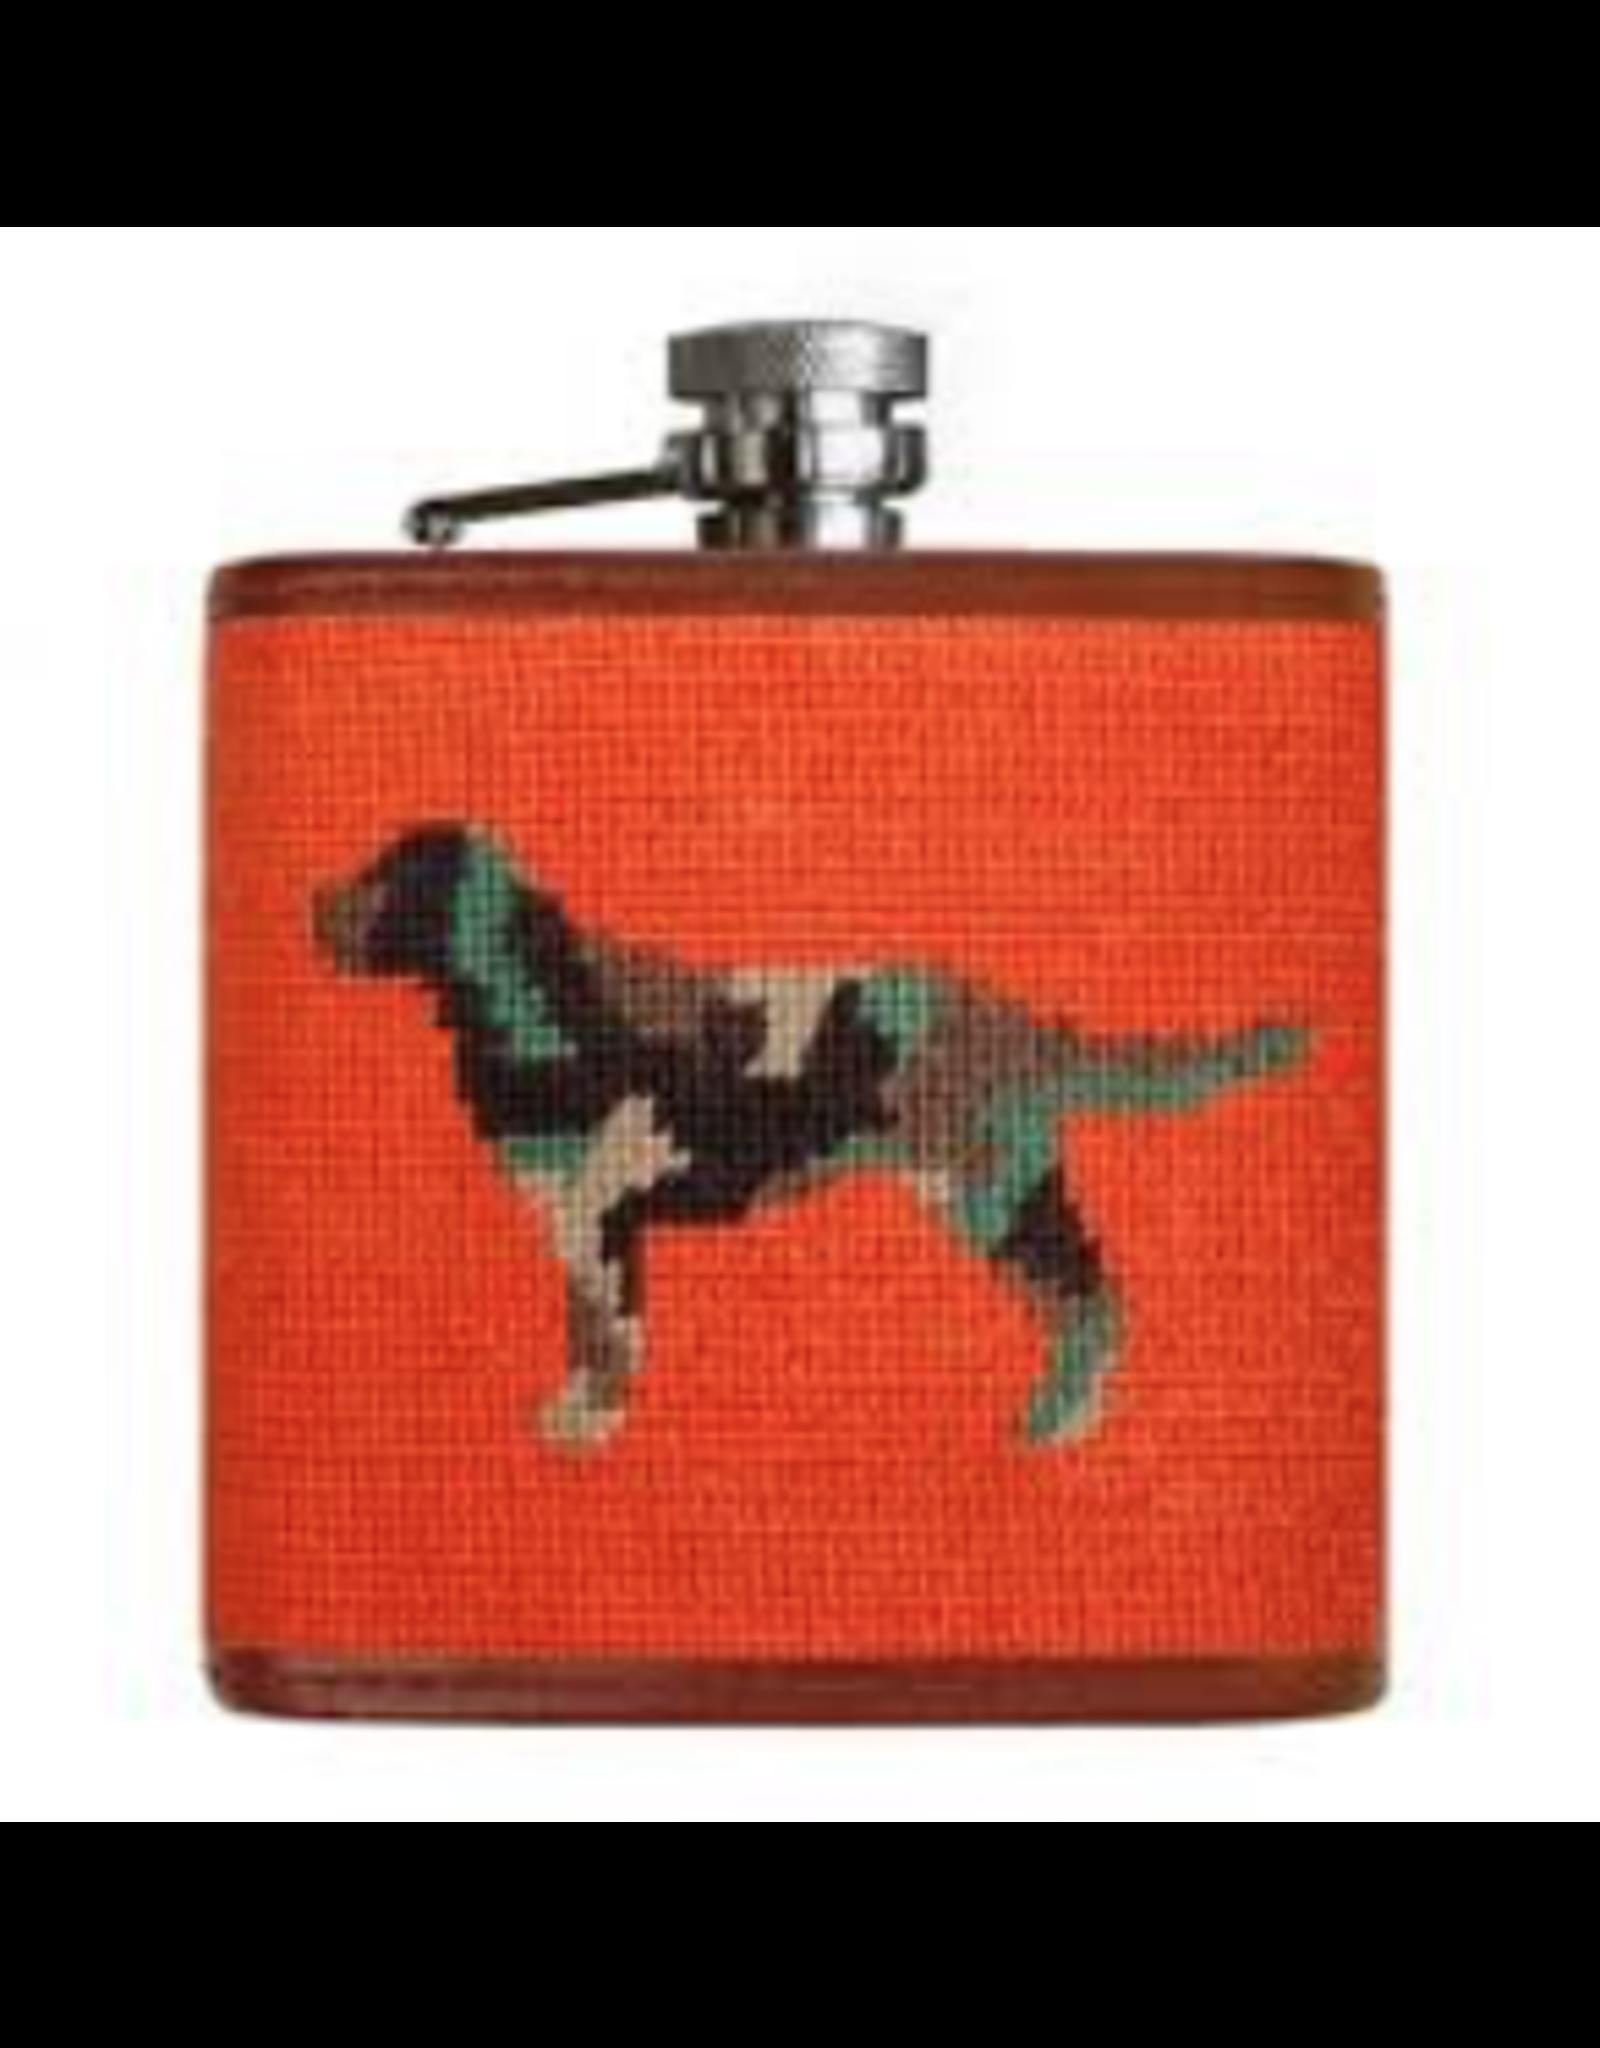 Smathers & Branson S&B Flask, Camo Retriever on orange